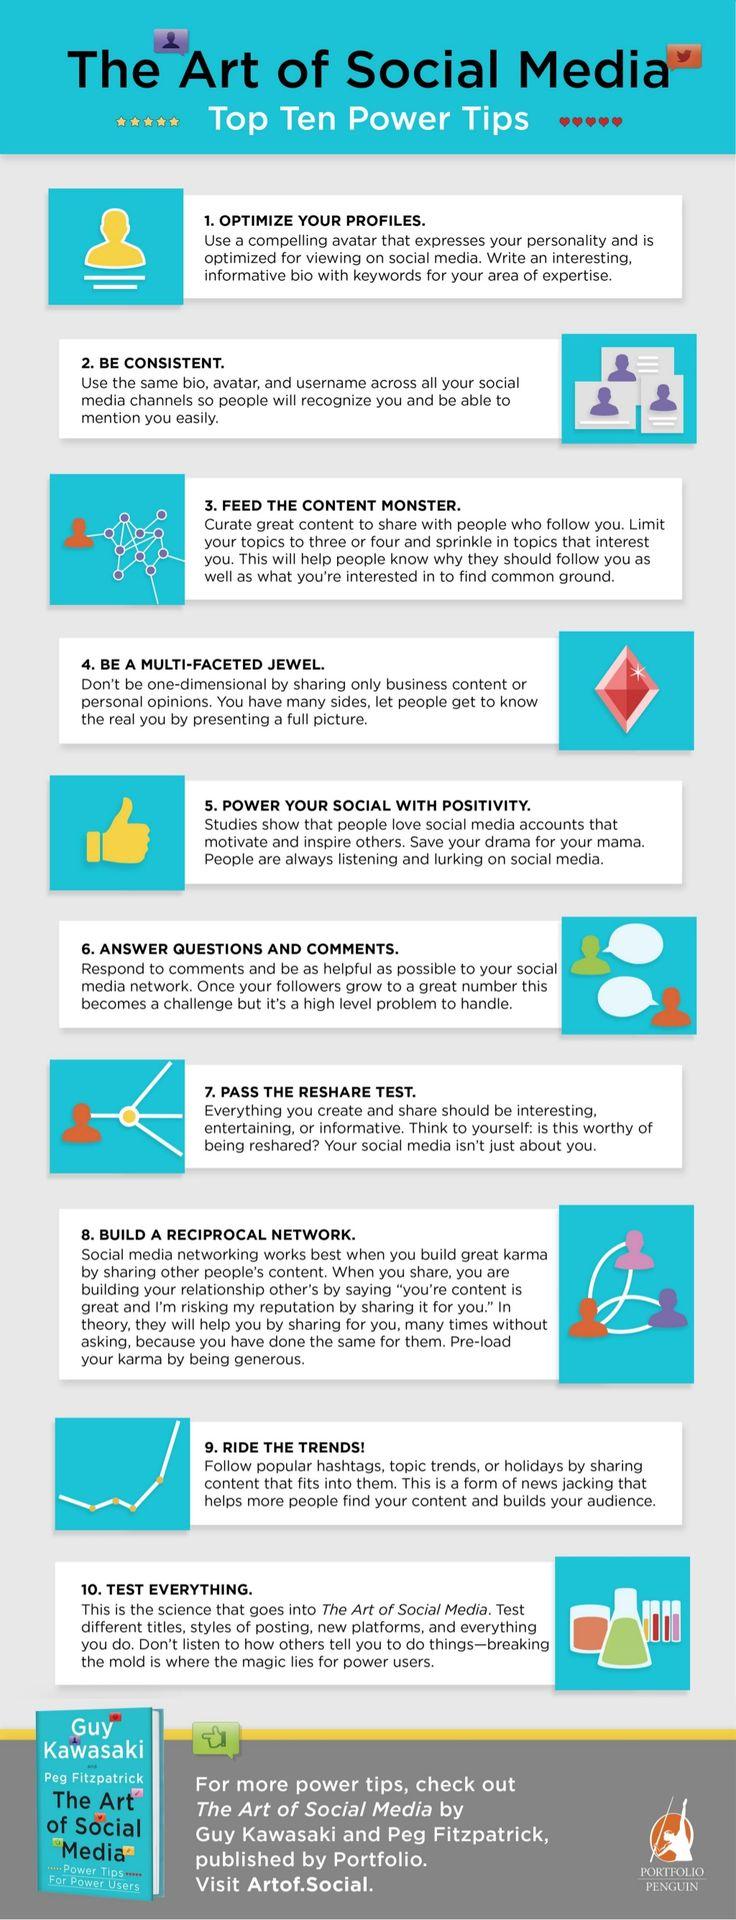 The Art of Social Media Infographic - @guykawasaki @pegfitzpatrick